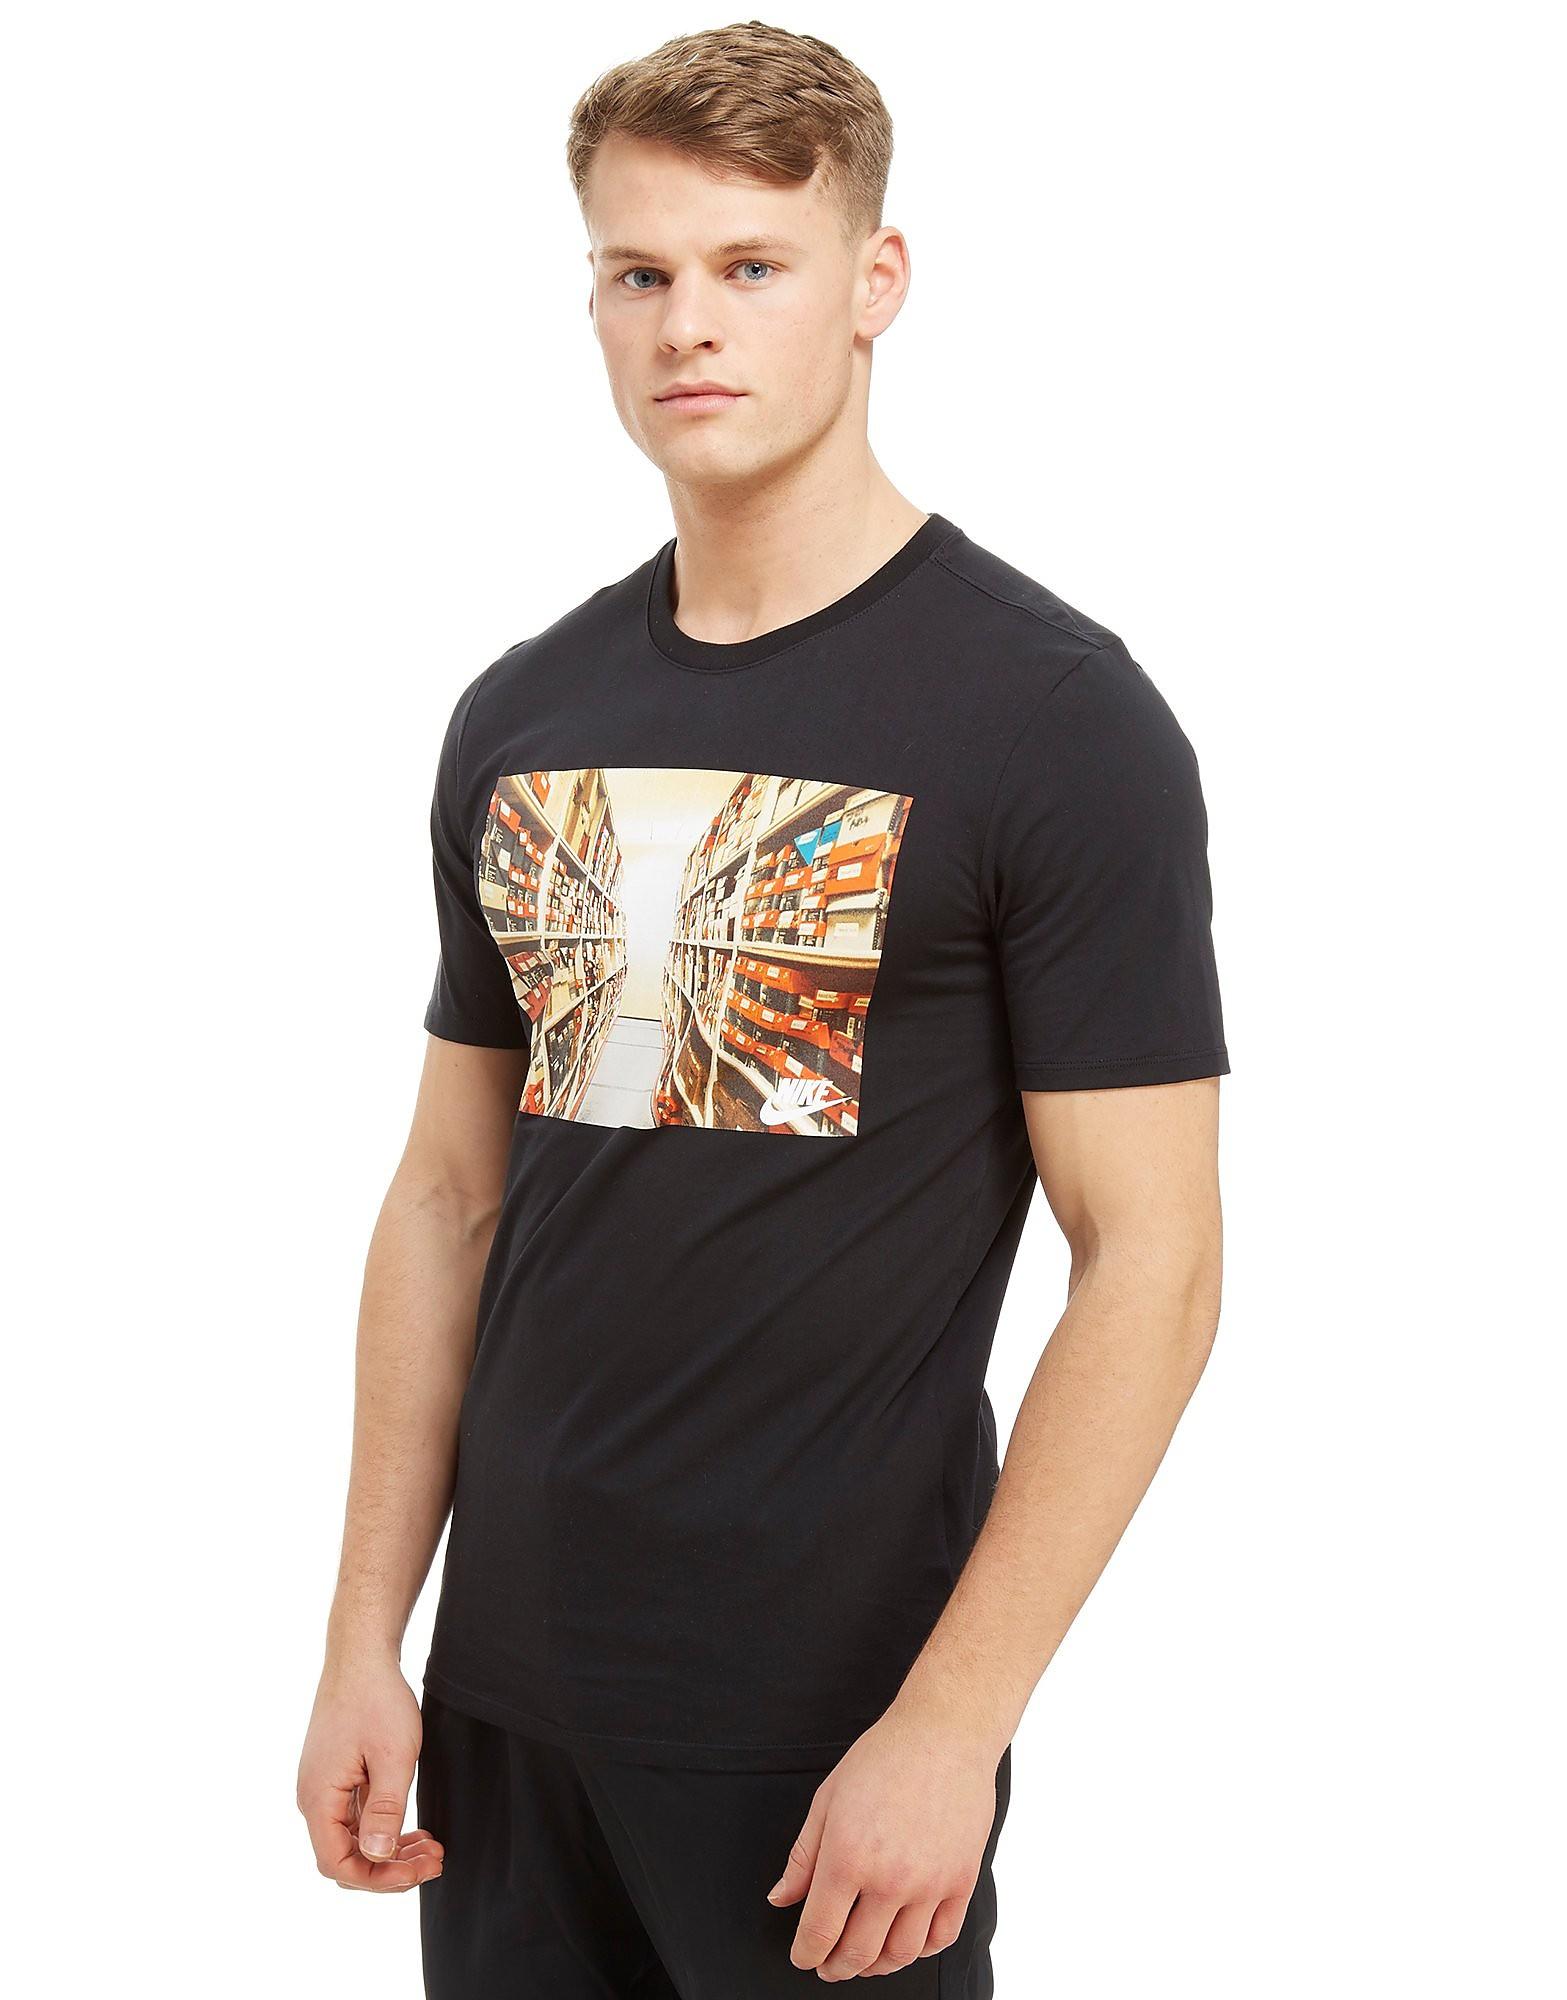 Nike Photo Archive T-Shirt